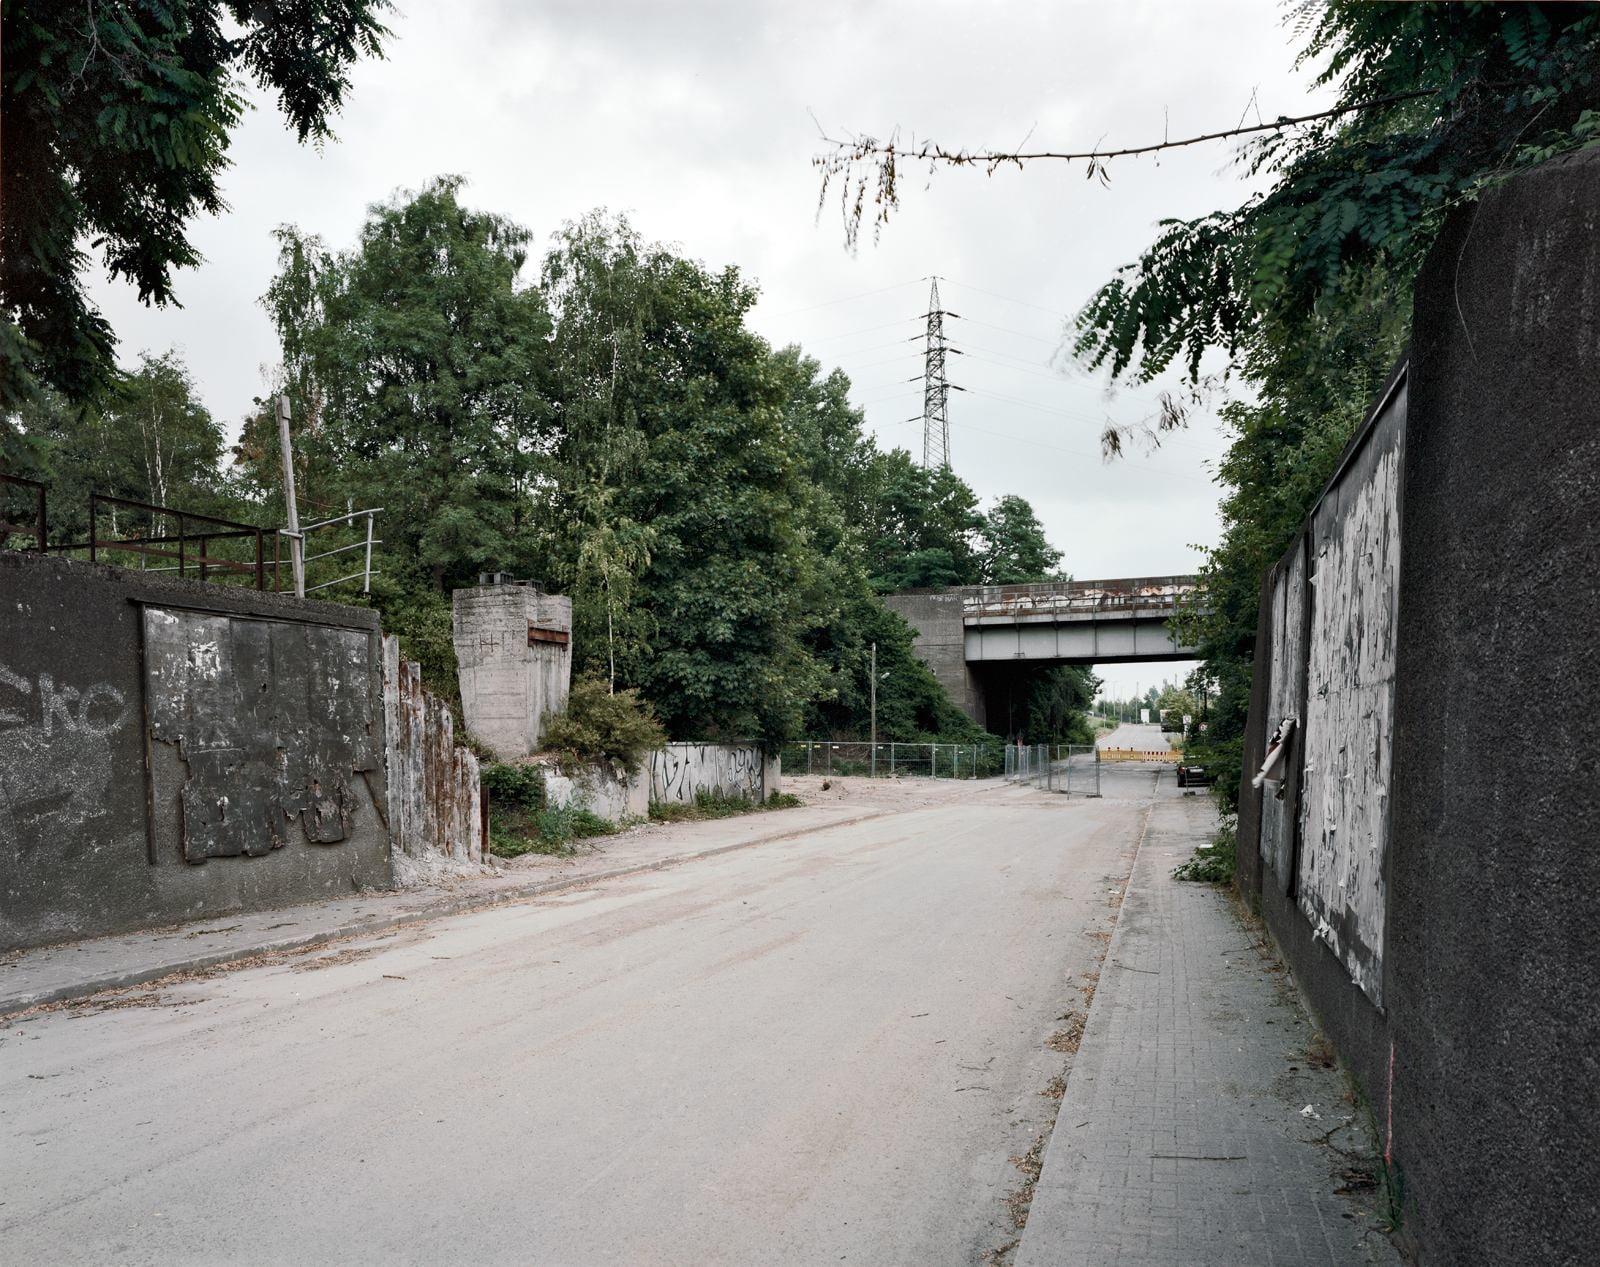 Huckarder Straße